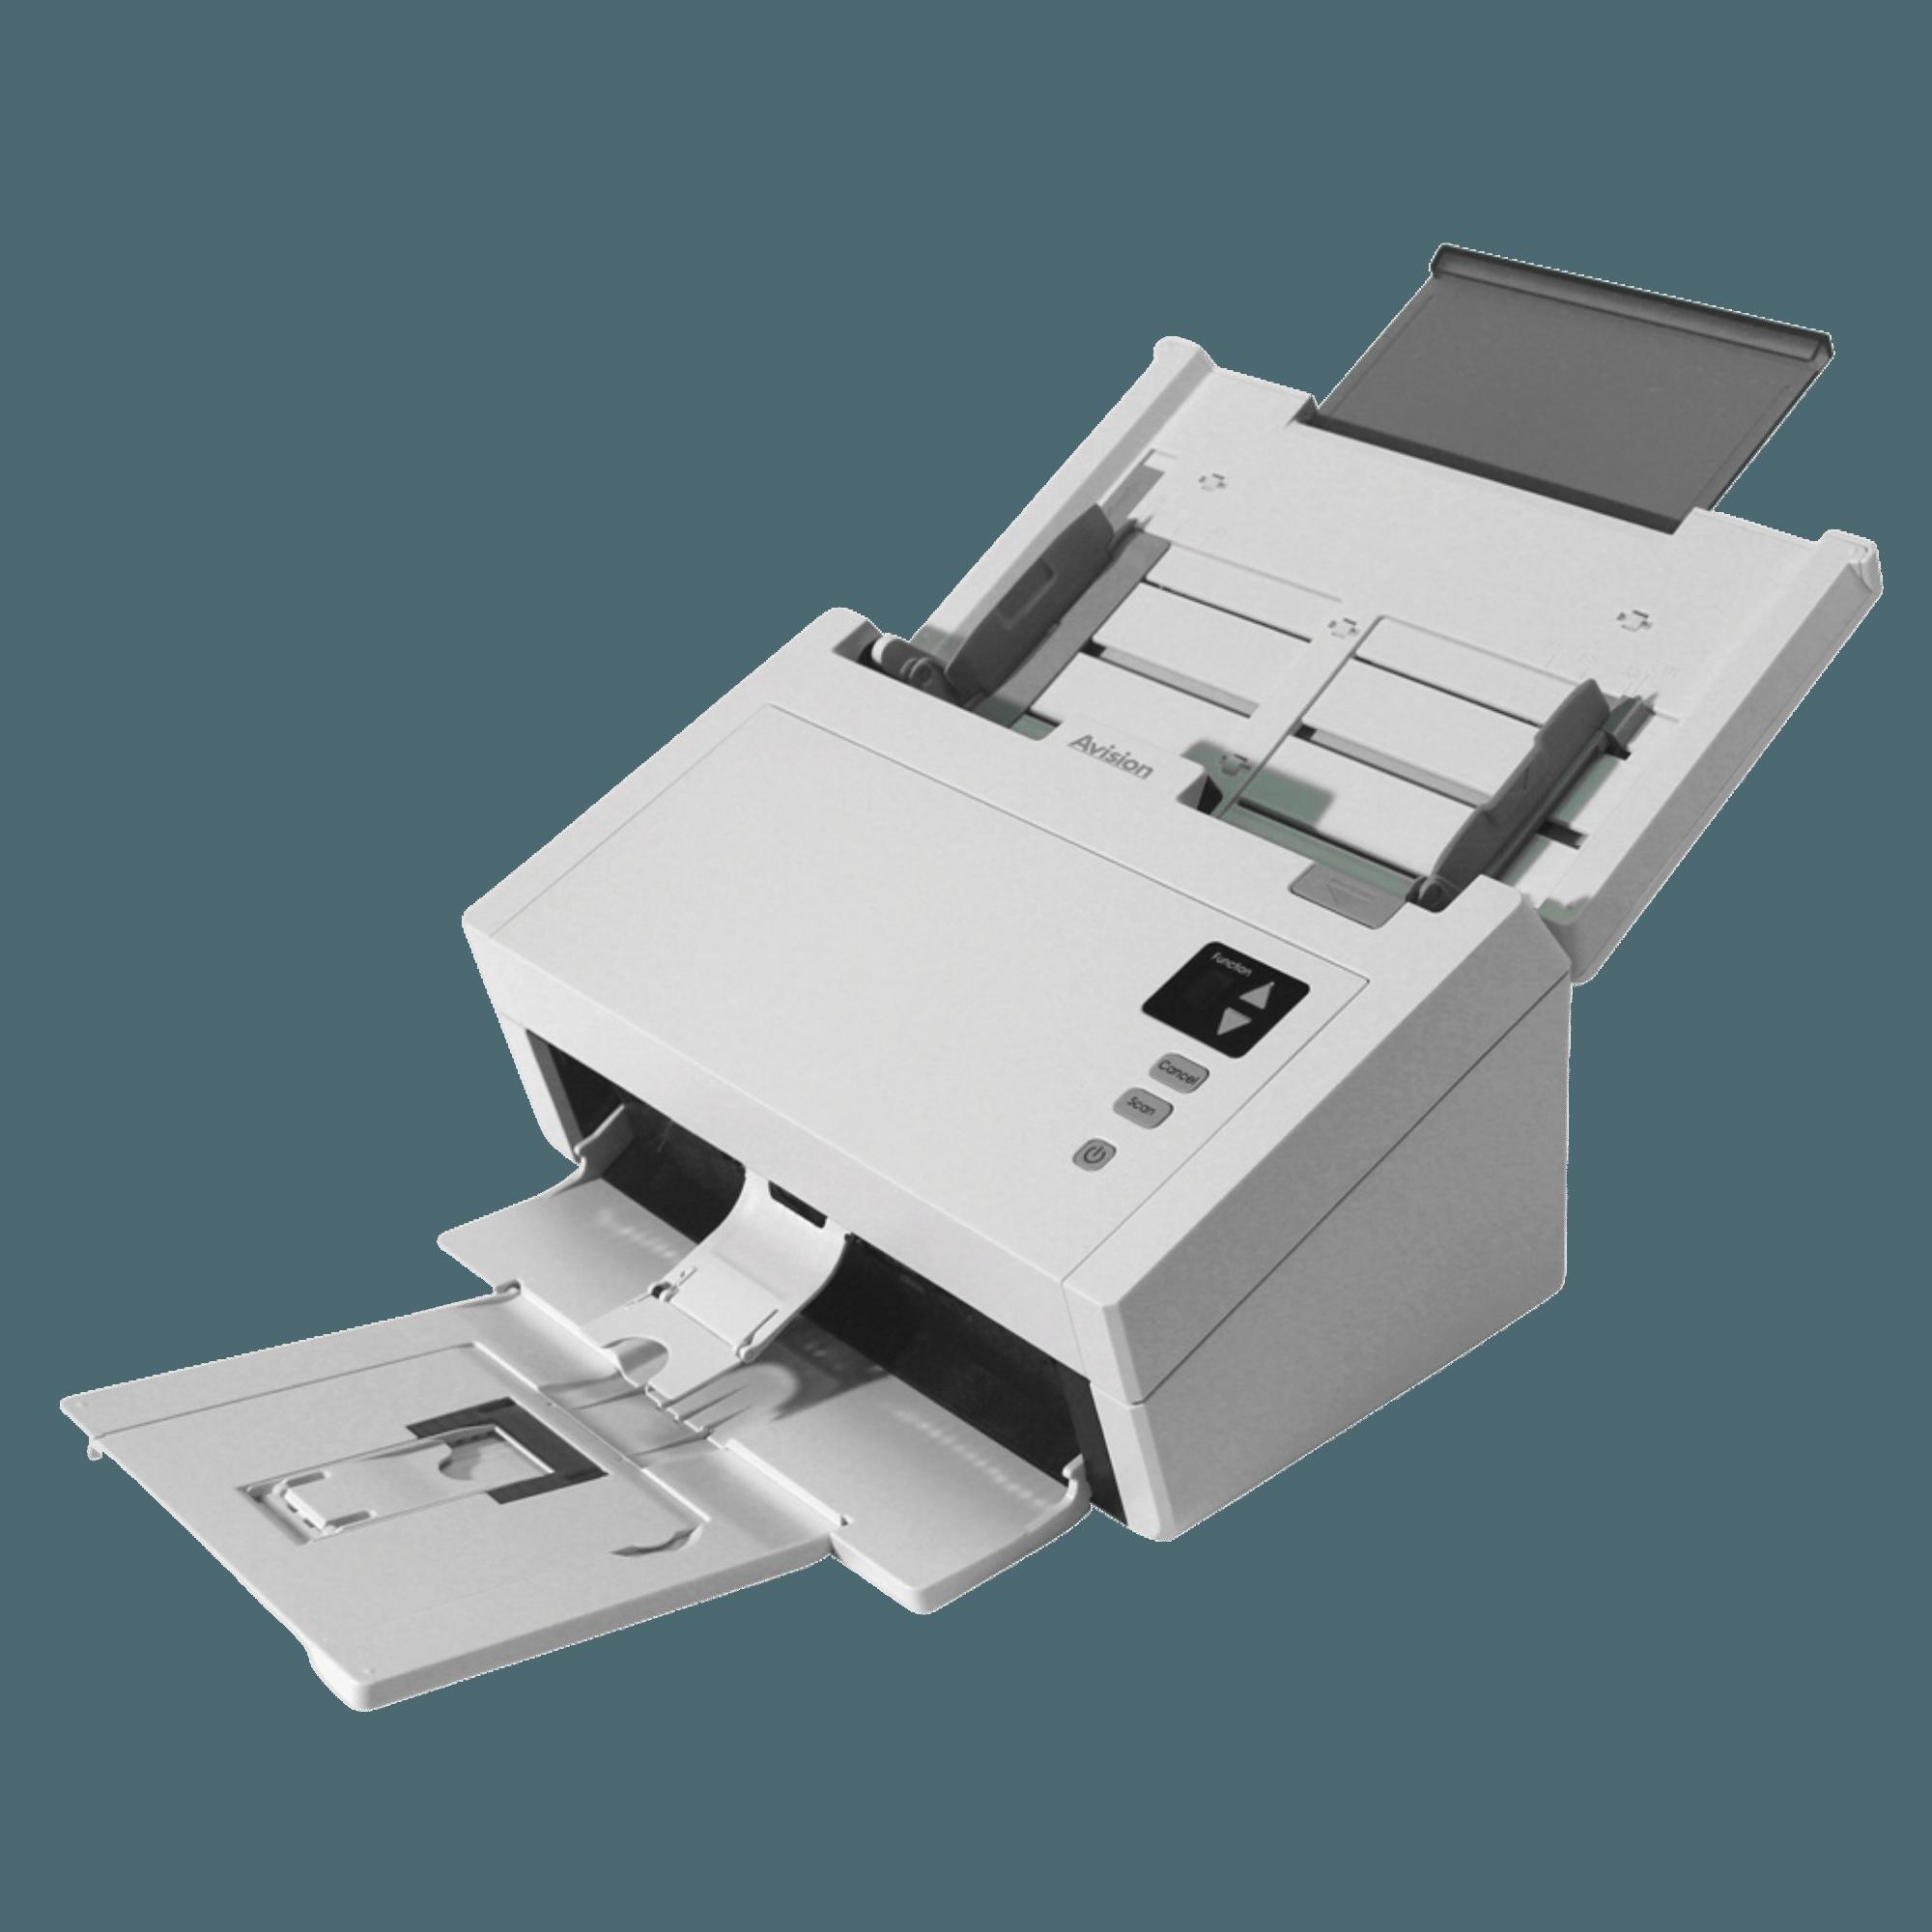 Avision AD230 40ppm 8.5x118